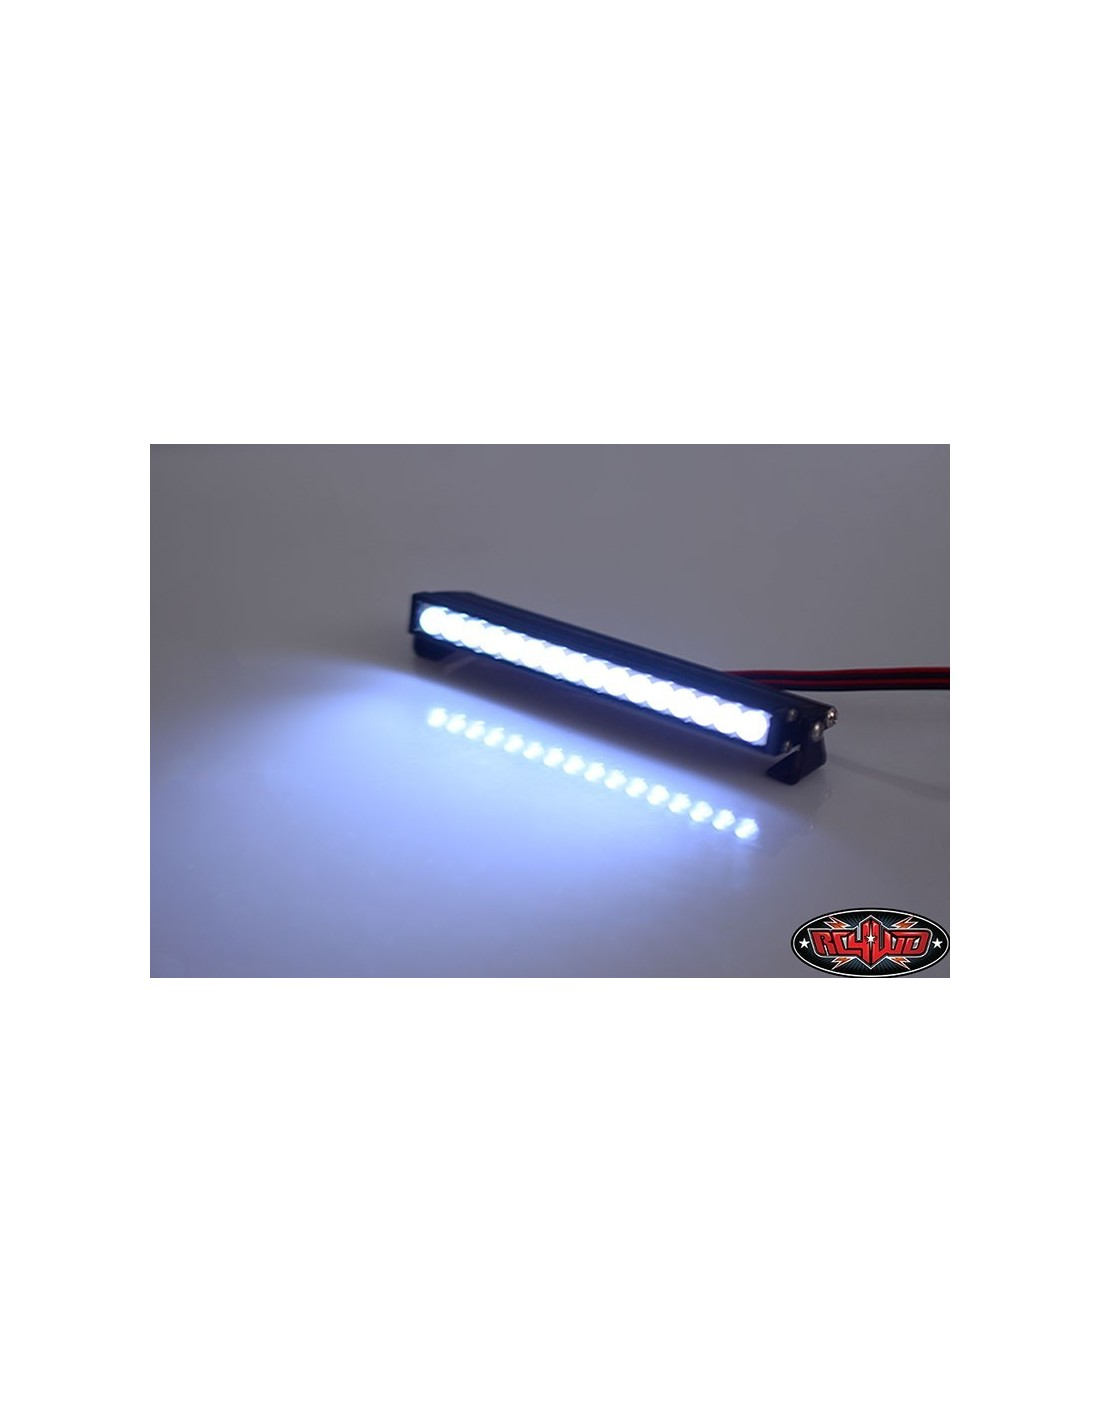 110 baja designs s8 led light bar 100mm rc4wd 110 baja designs s8 led light bar 100mm aloadofball Image collections